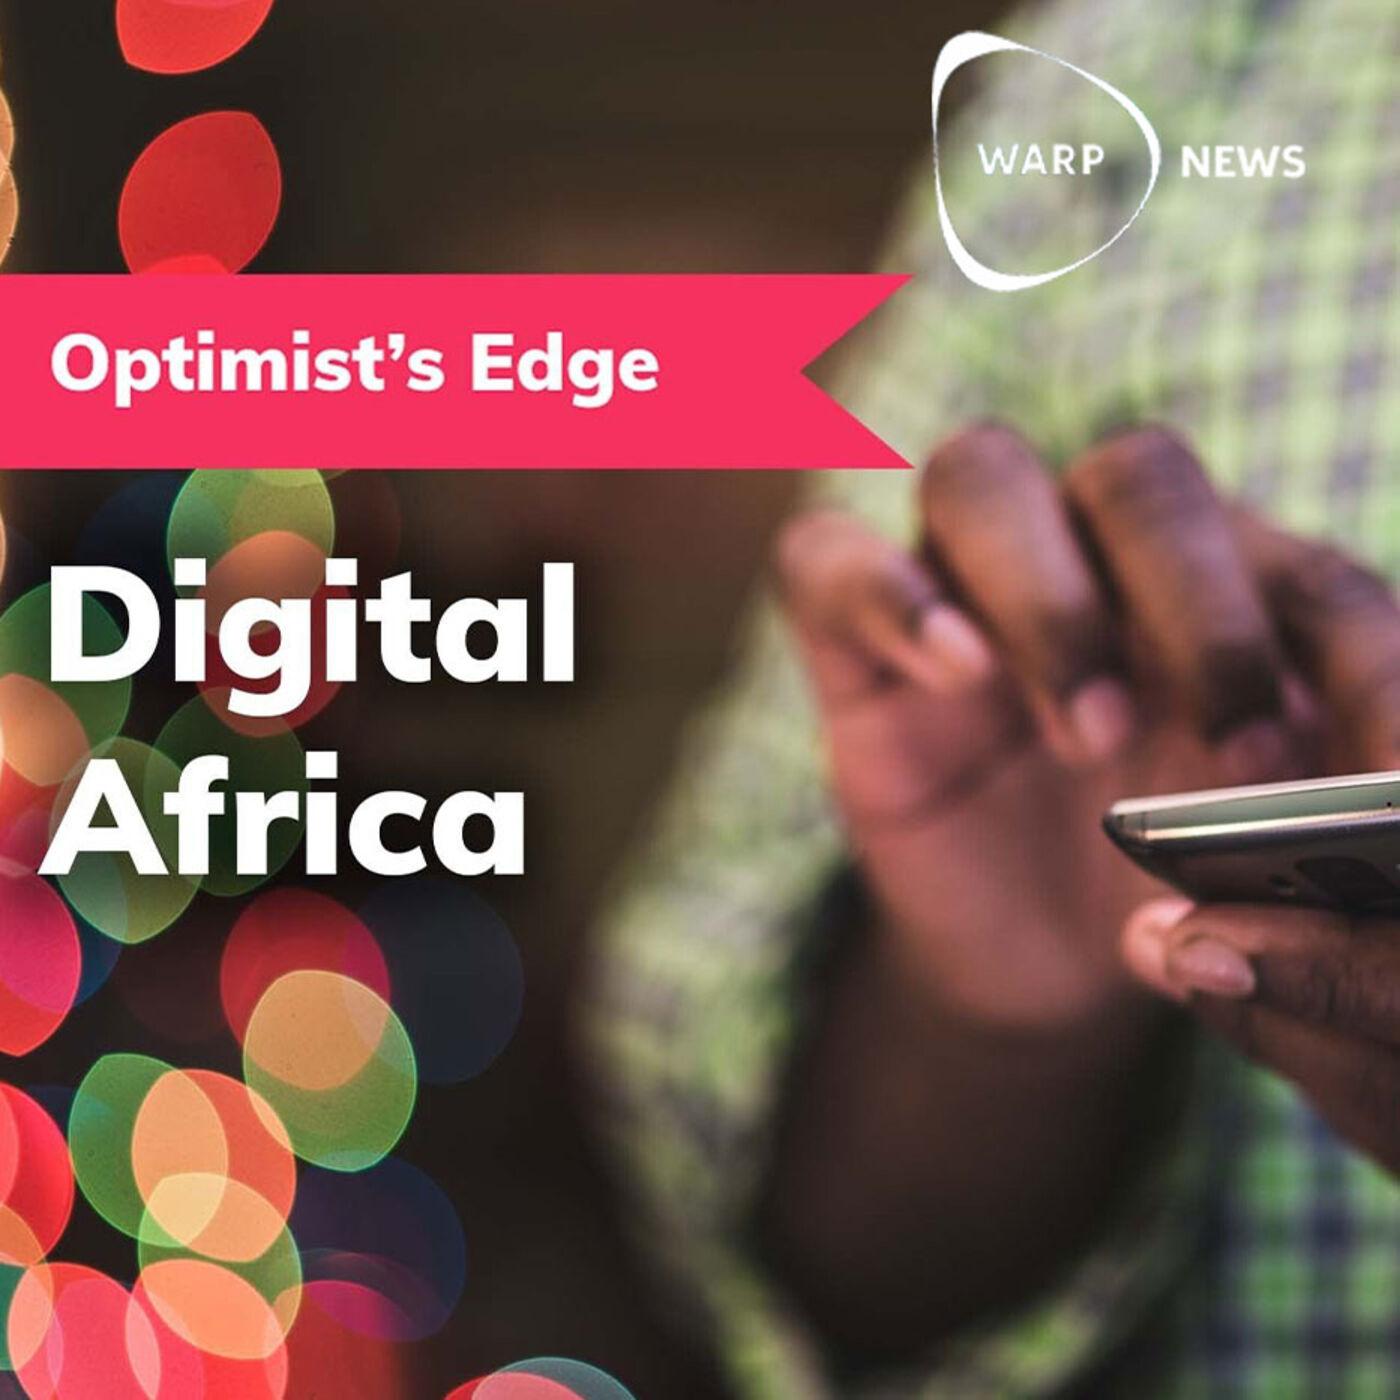 💡 Optimist's Edge: Digital Africa